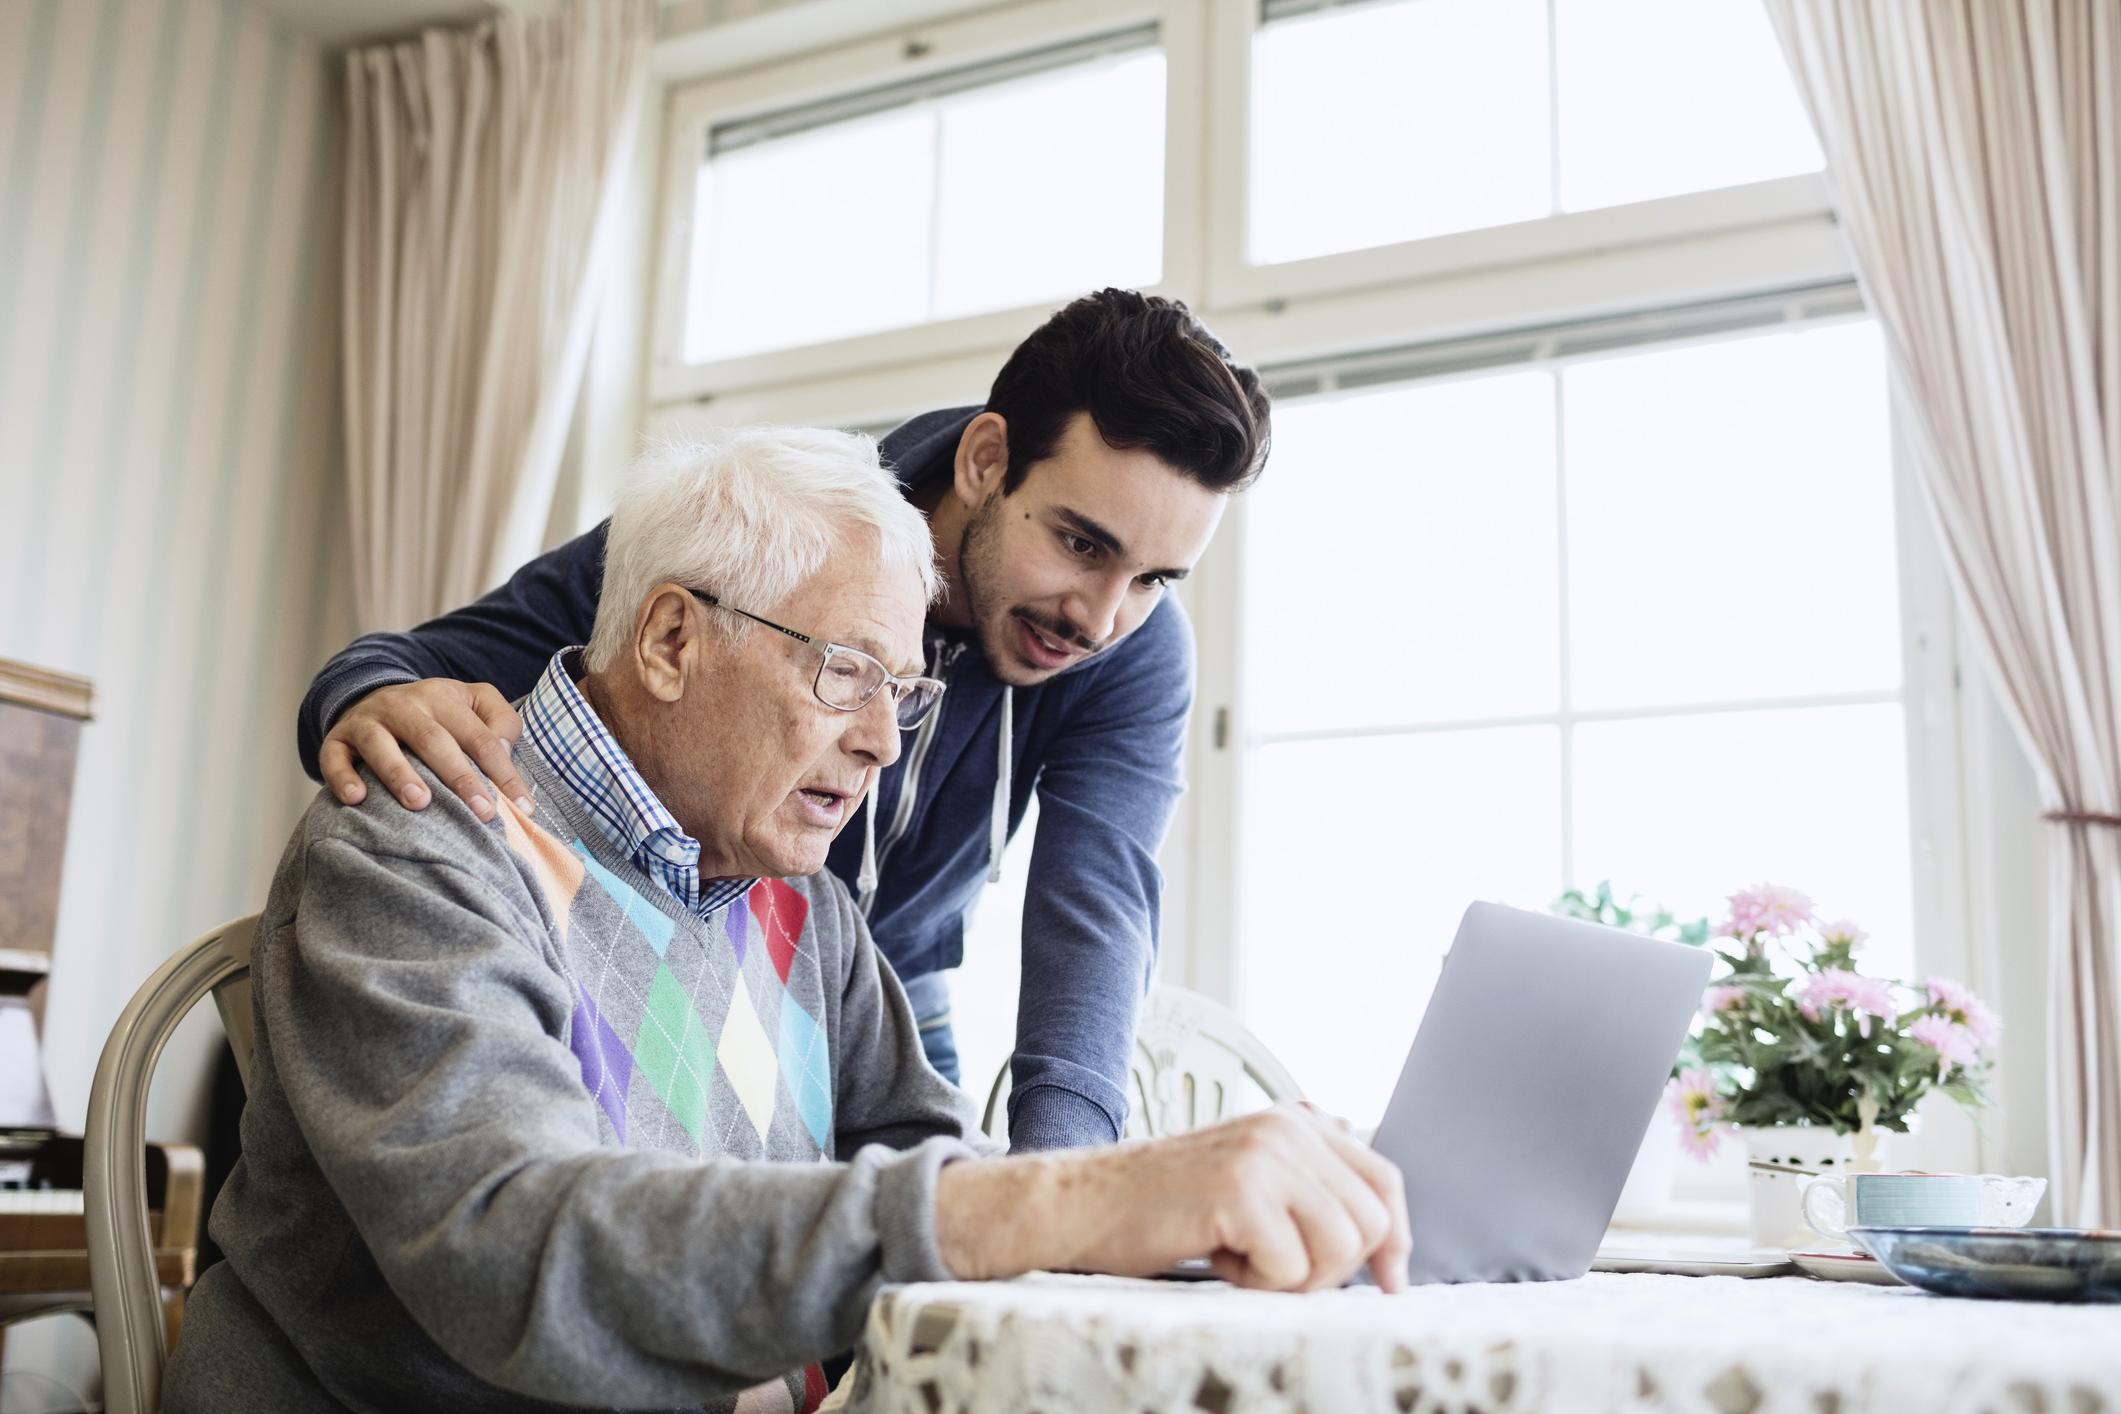 Companion caregiver and senior man using laptop